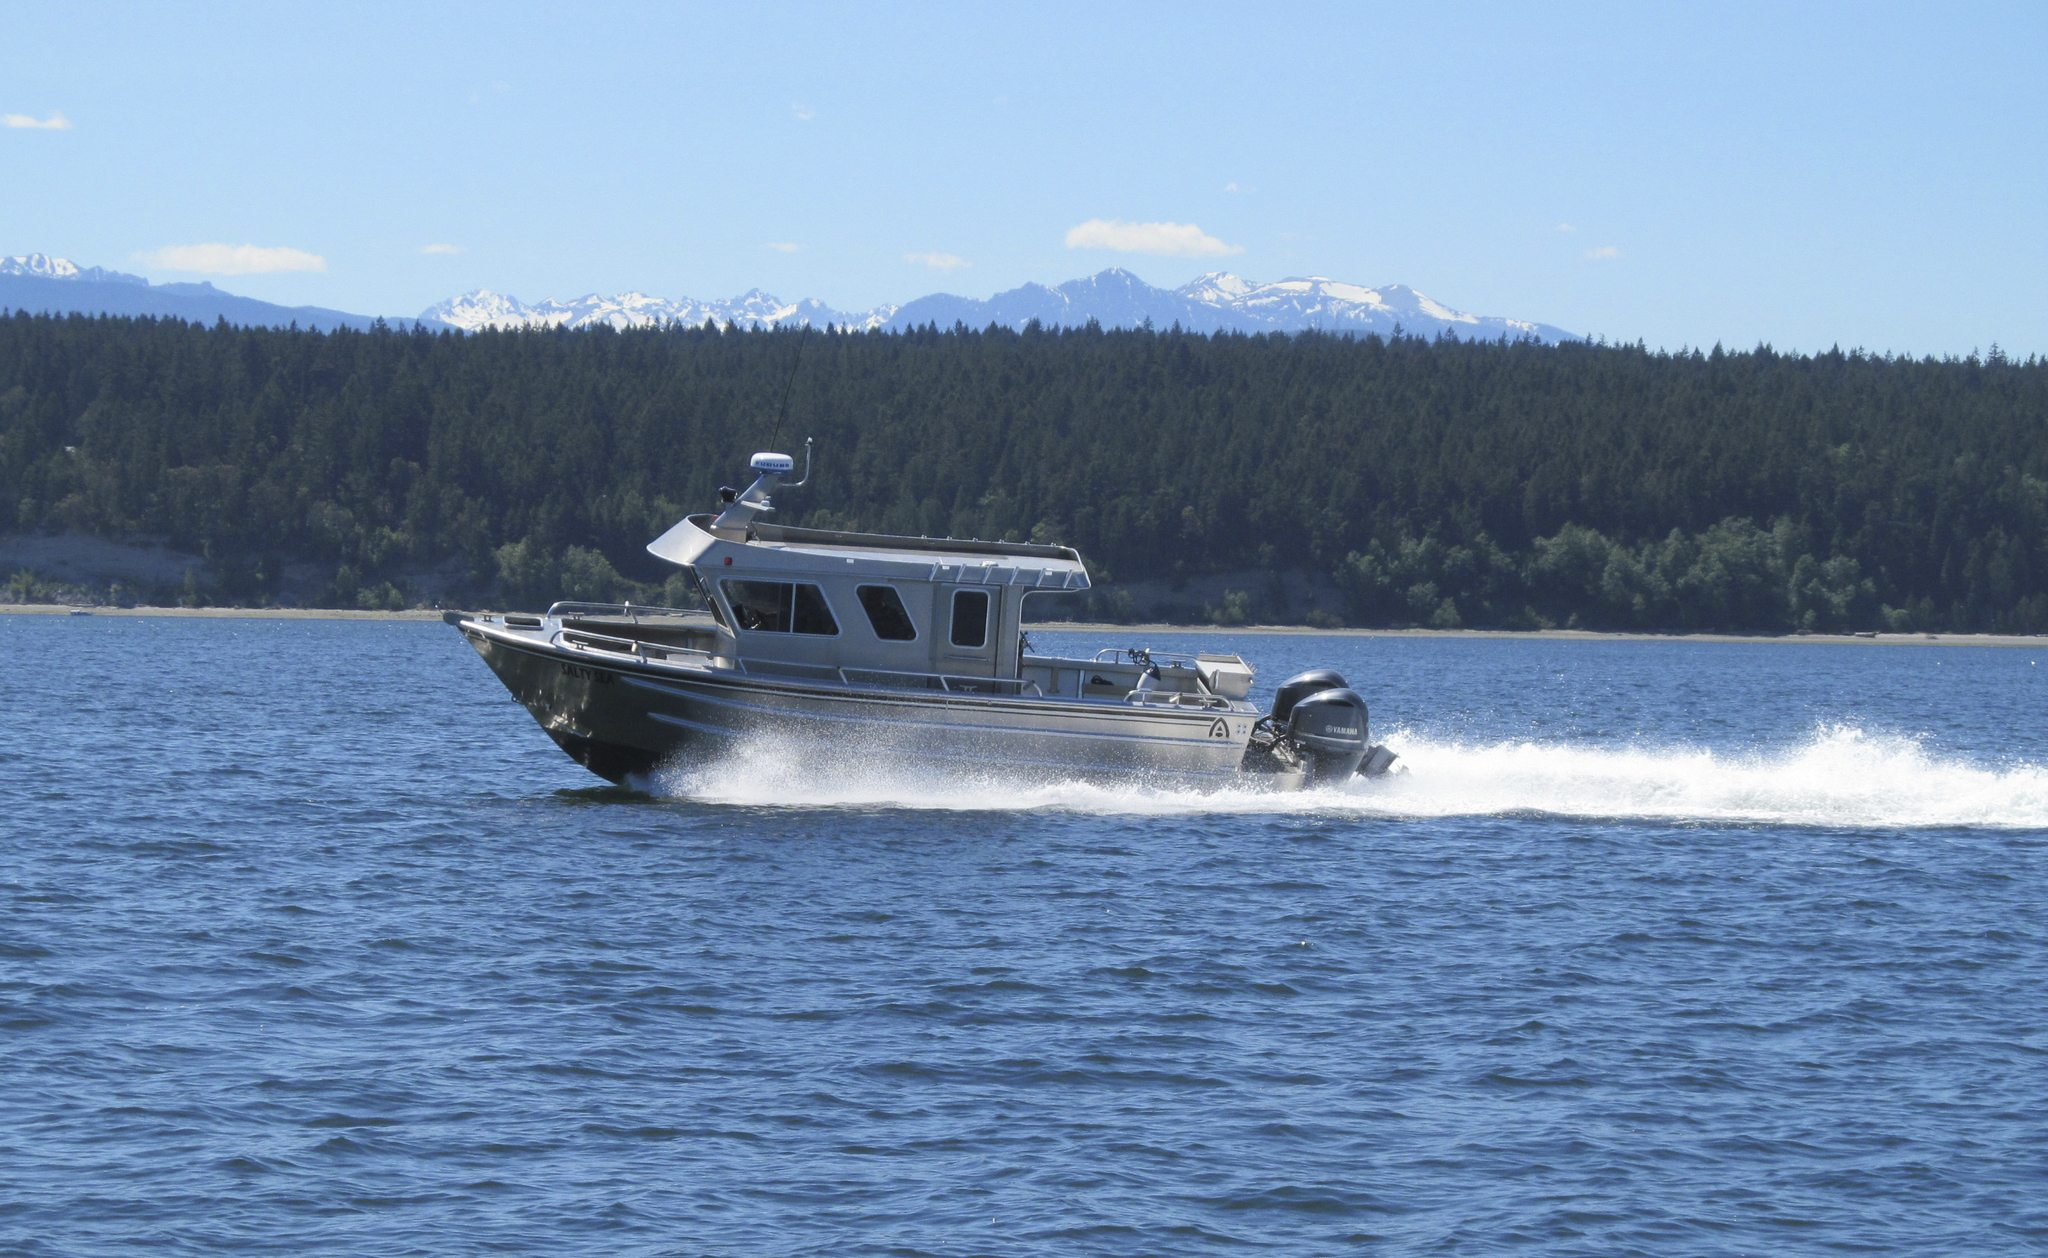 ACI Boats | All-Welded Aluminum Monohulls & Catamarans